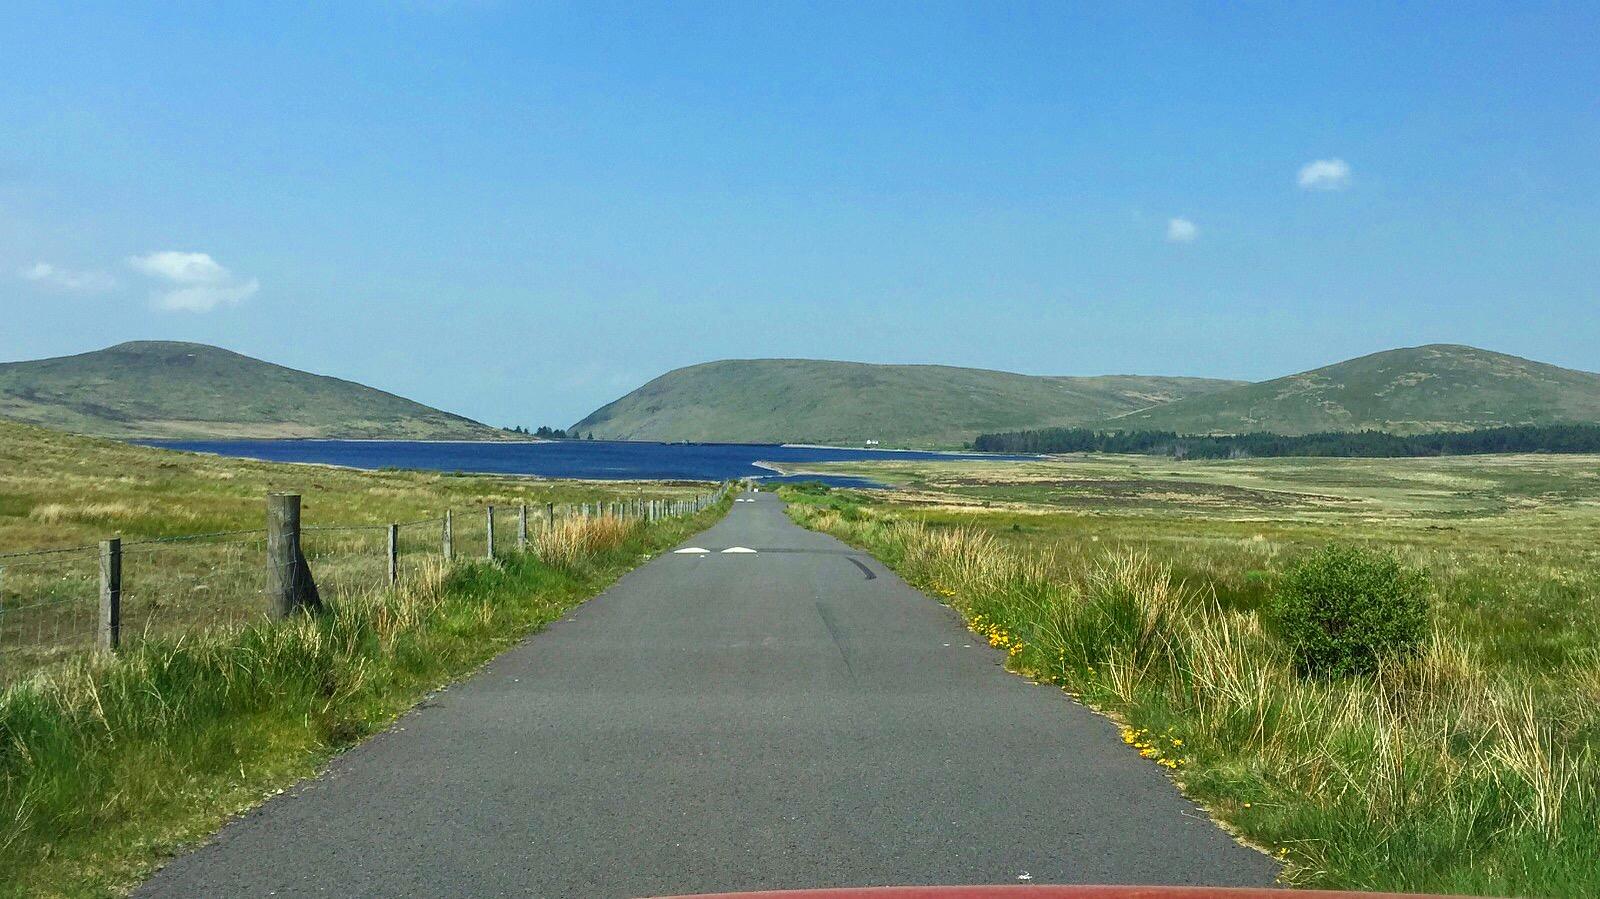 bluesky_panoramic_spelga_damn_mourne_mountains_ni_explorer_niexplorer_northern_ireland_blog.jpg